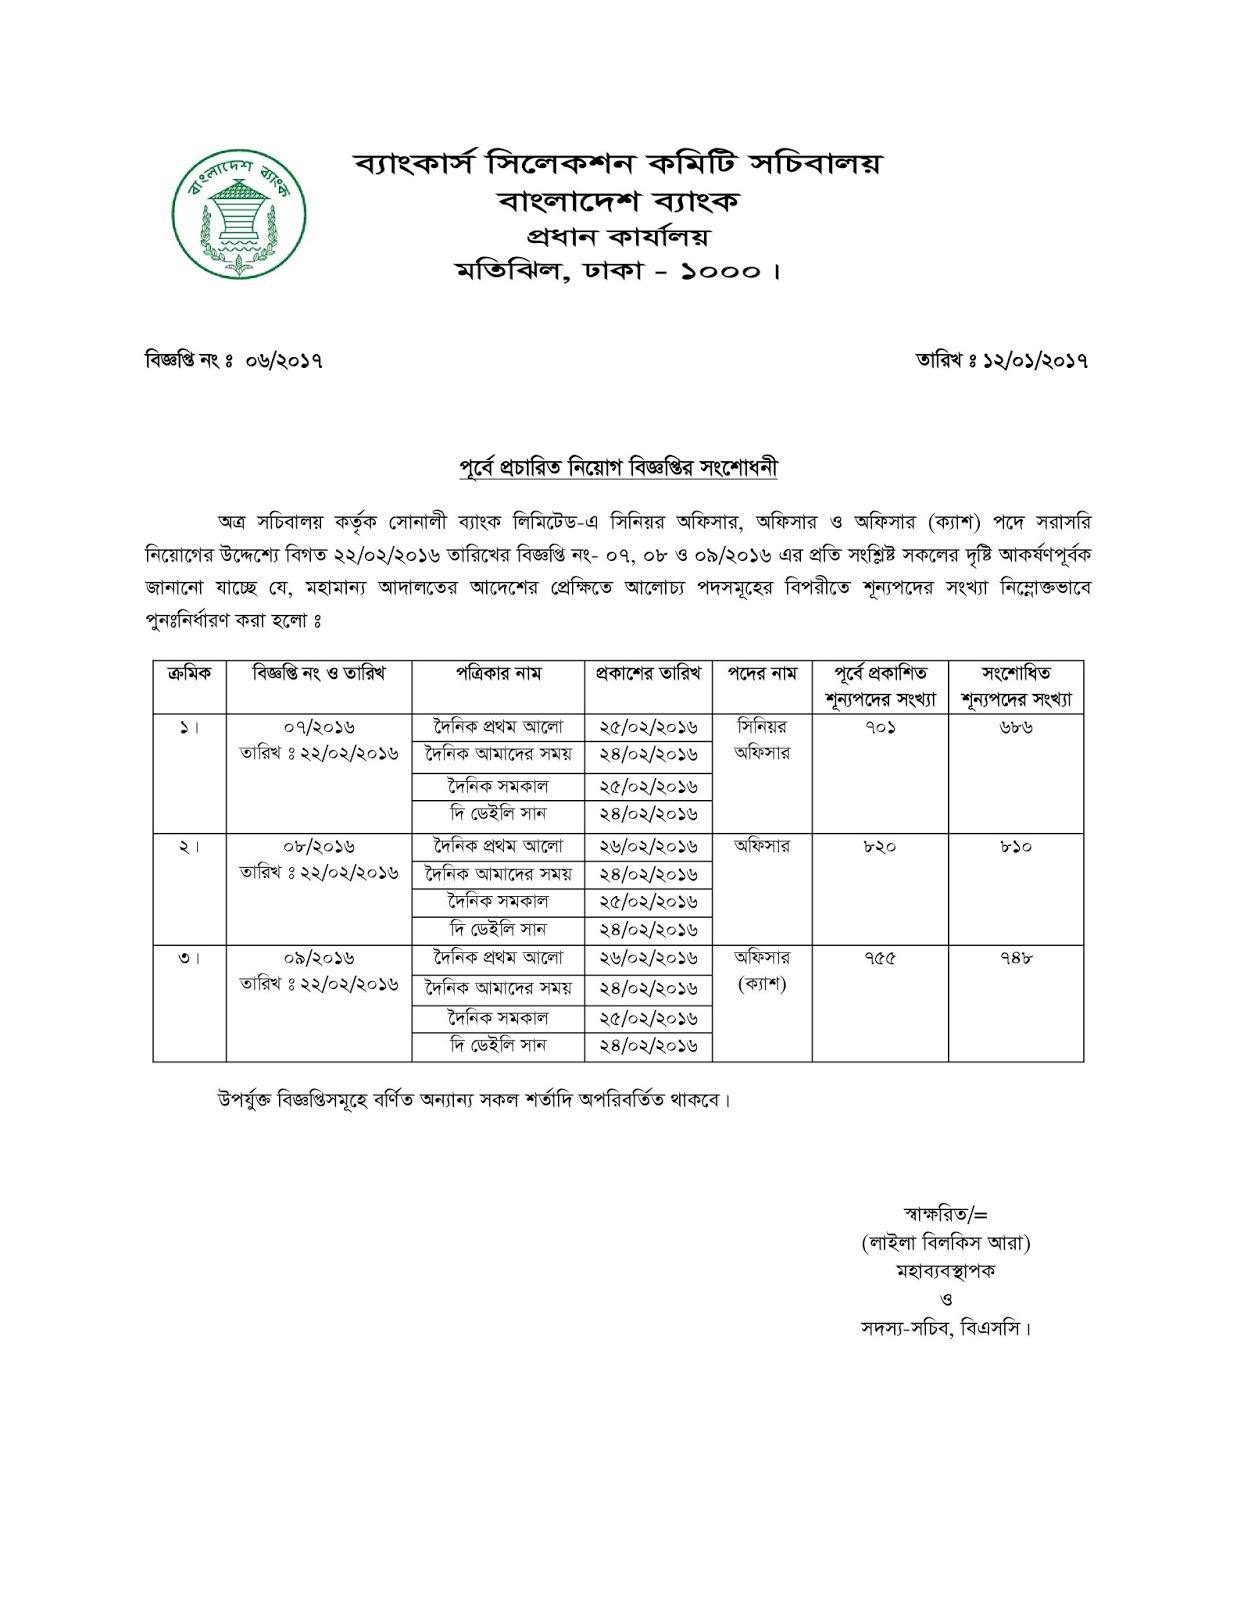 Sonali Bank Job  Notice 2017 for Posts Correction